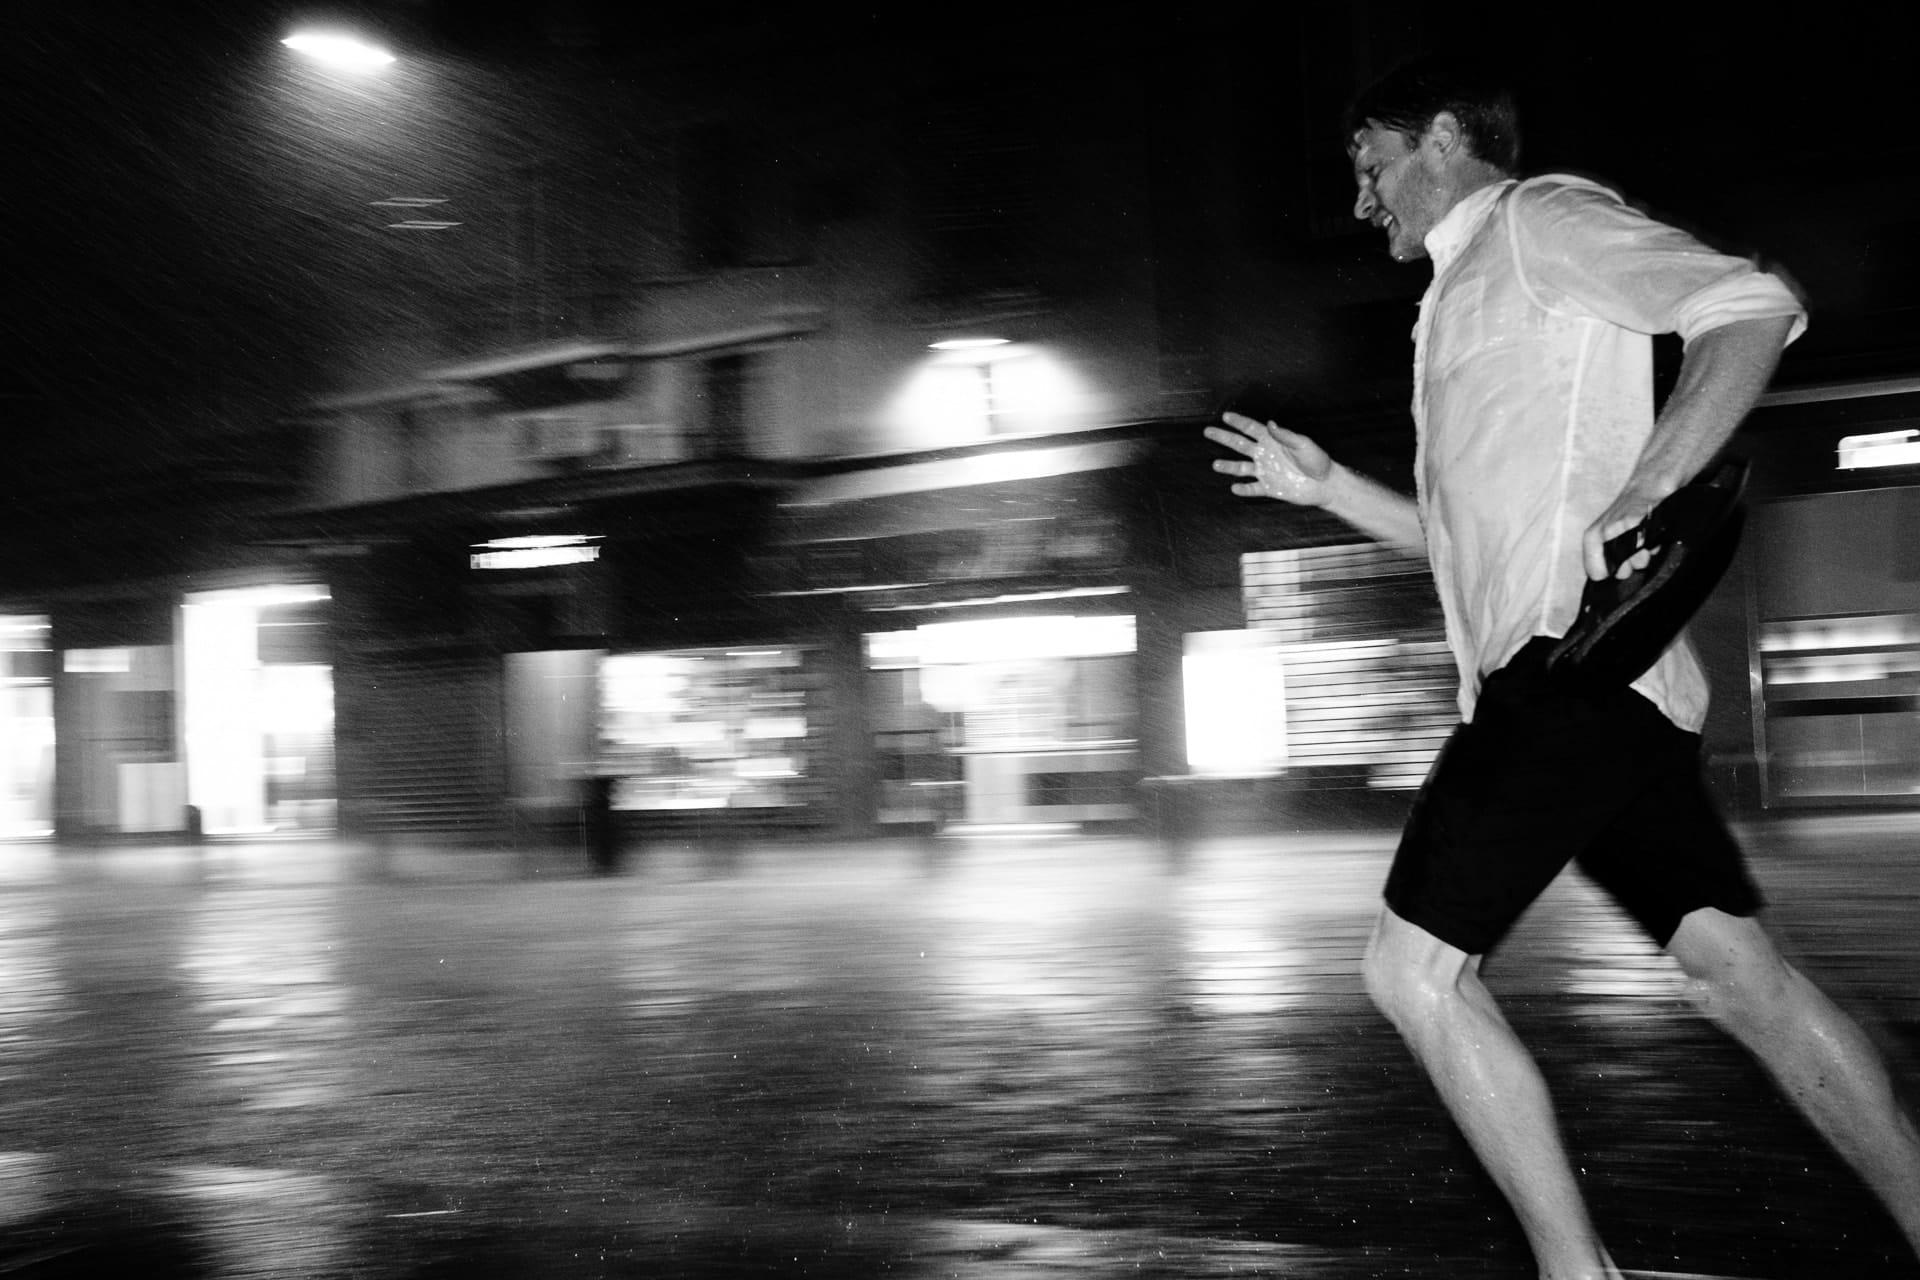 Rainy day street photograph by andrea bellettini